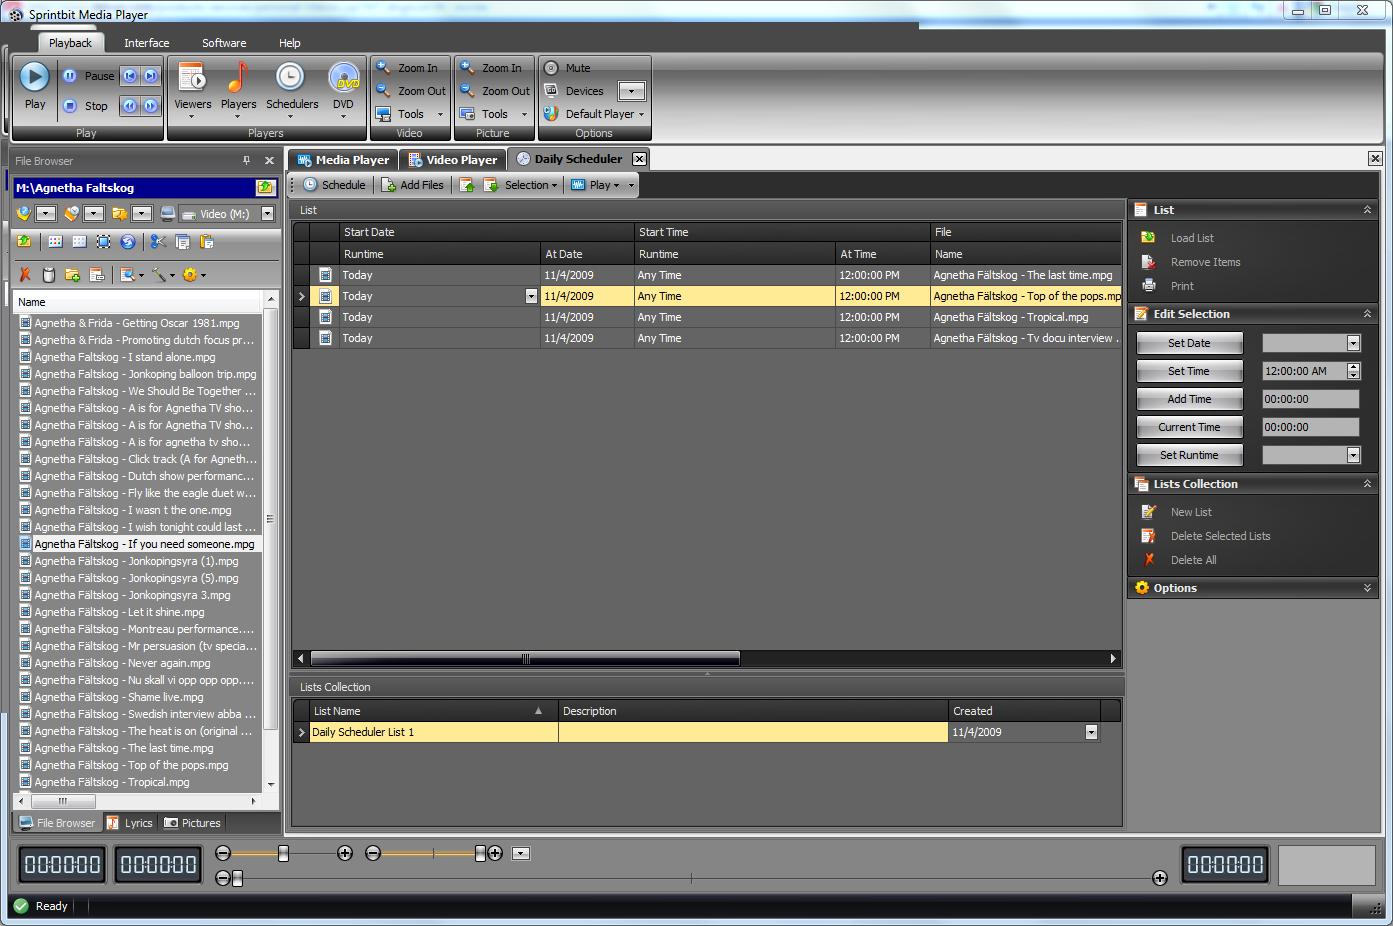 mediaplayer software